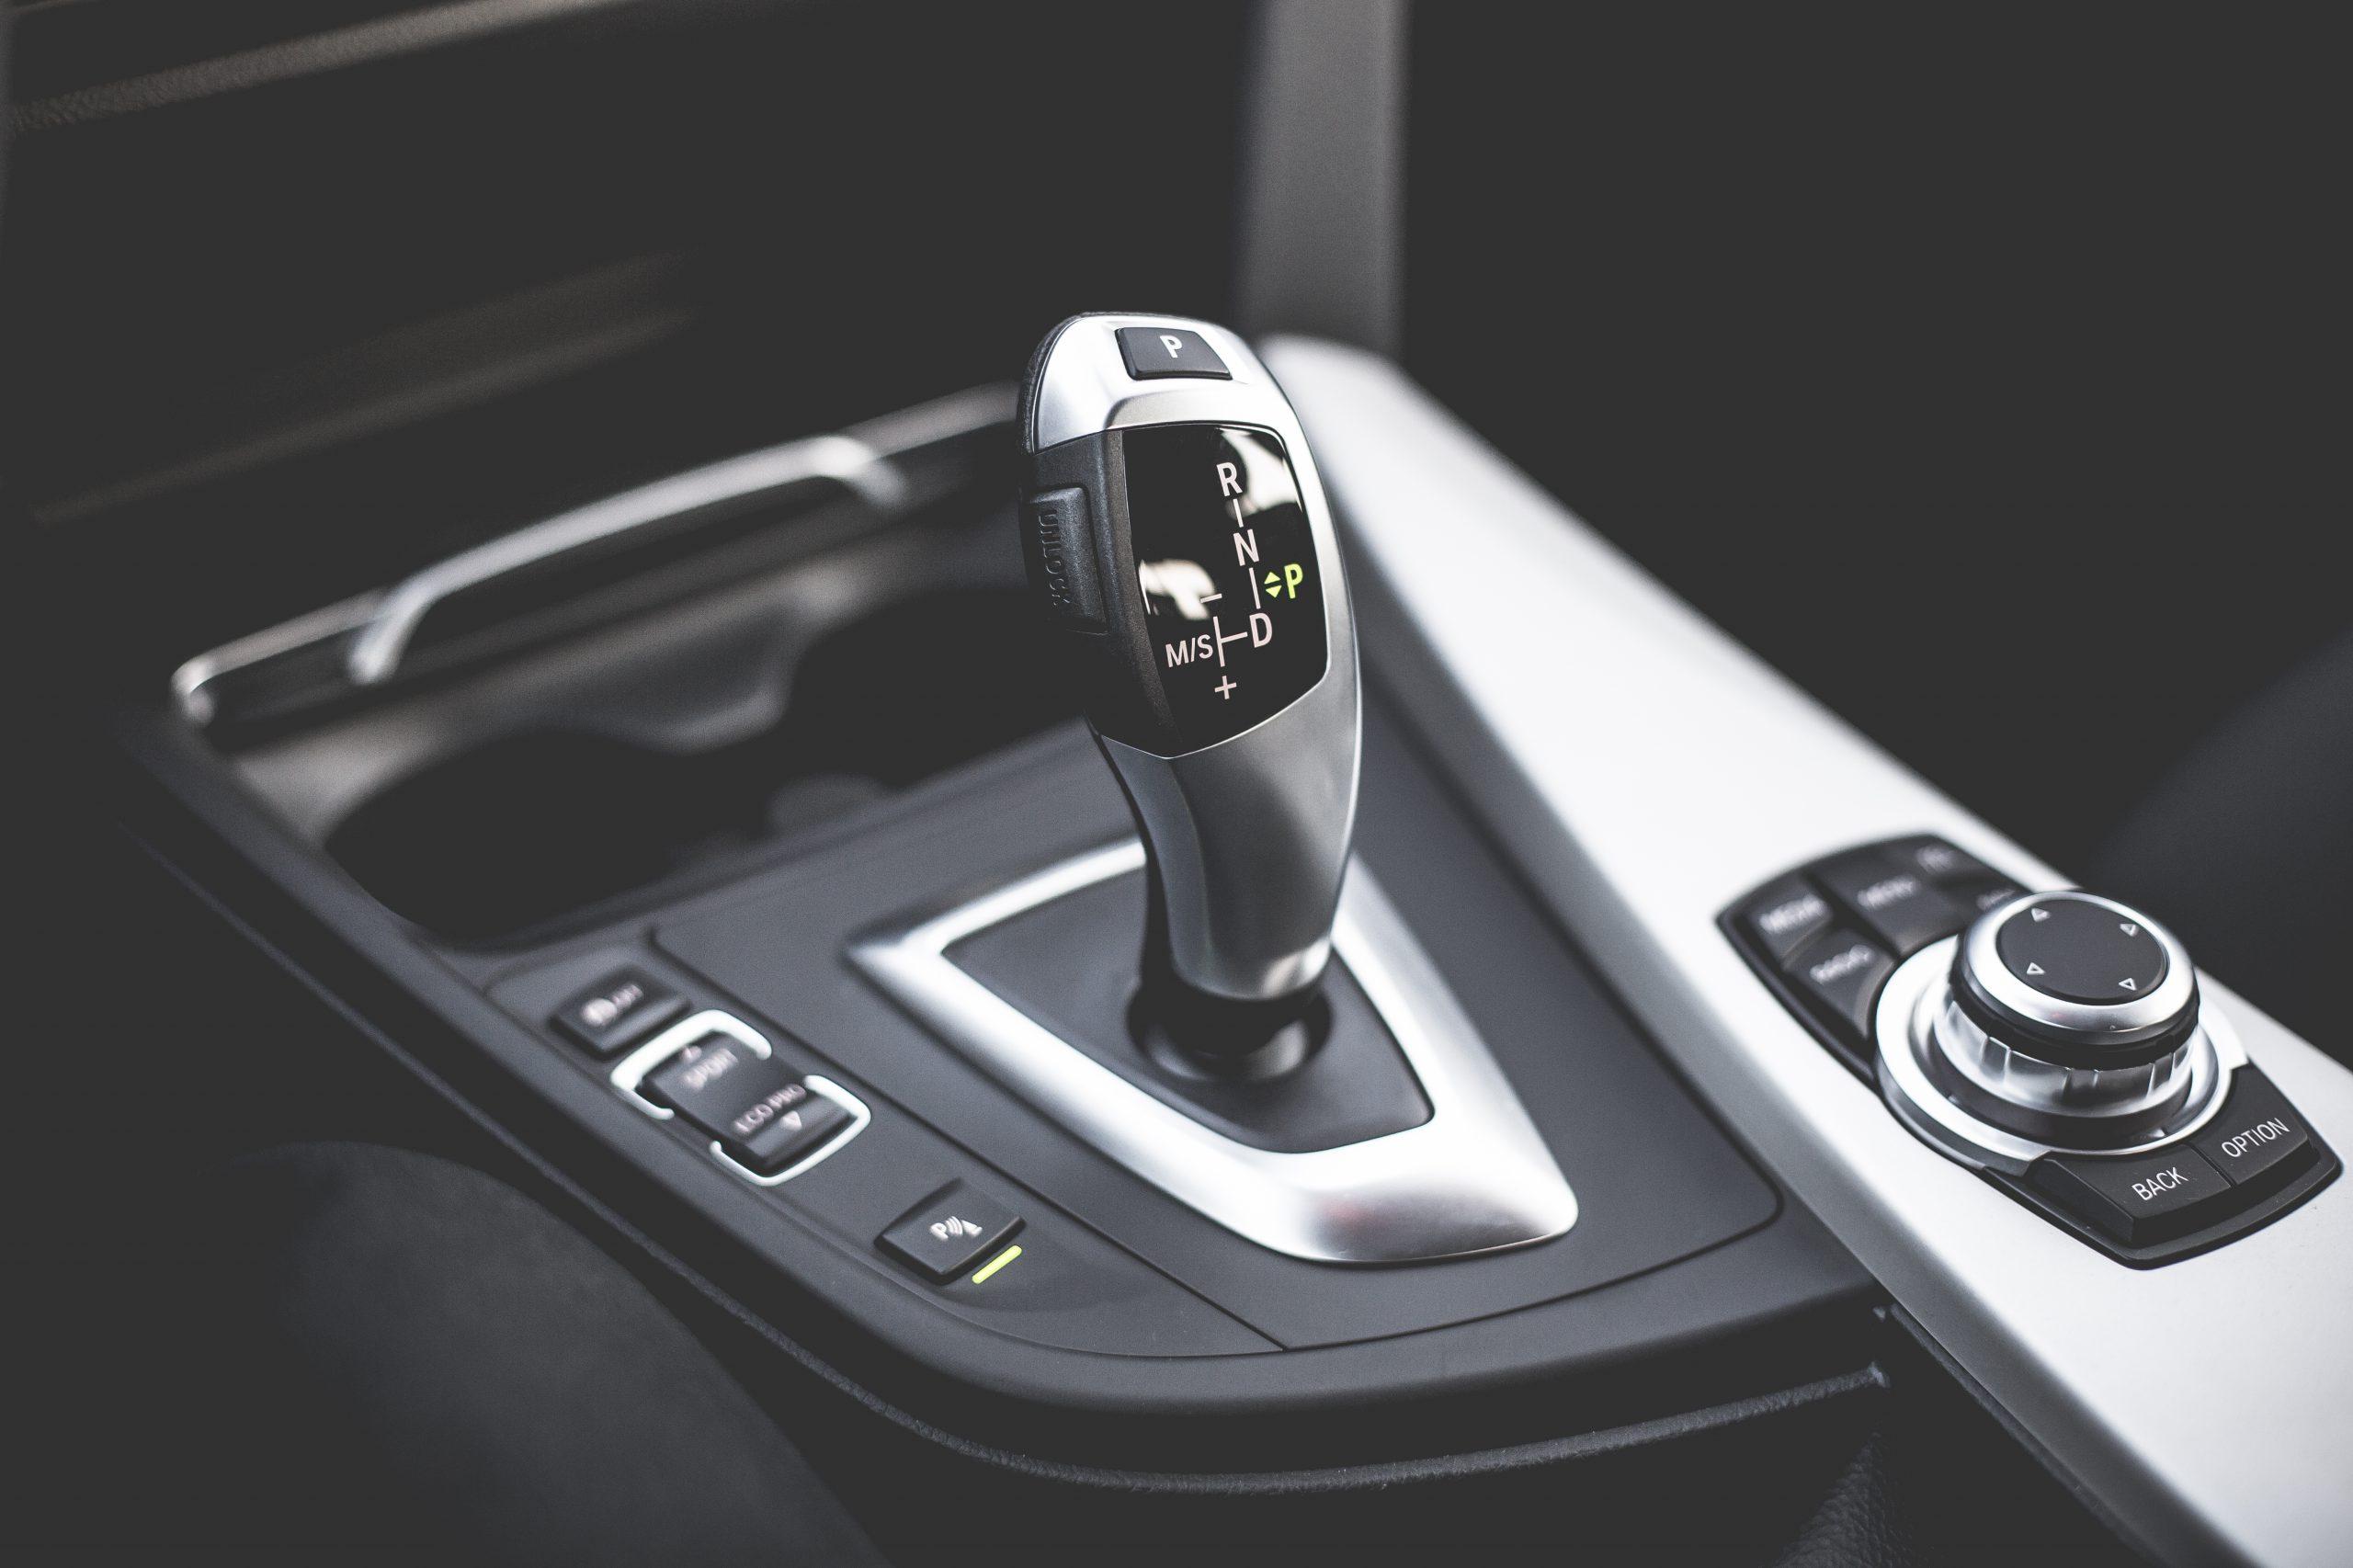 automatic-transmission-gear-shift-in-modern-car-picjumbo-com